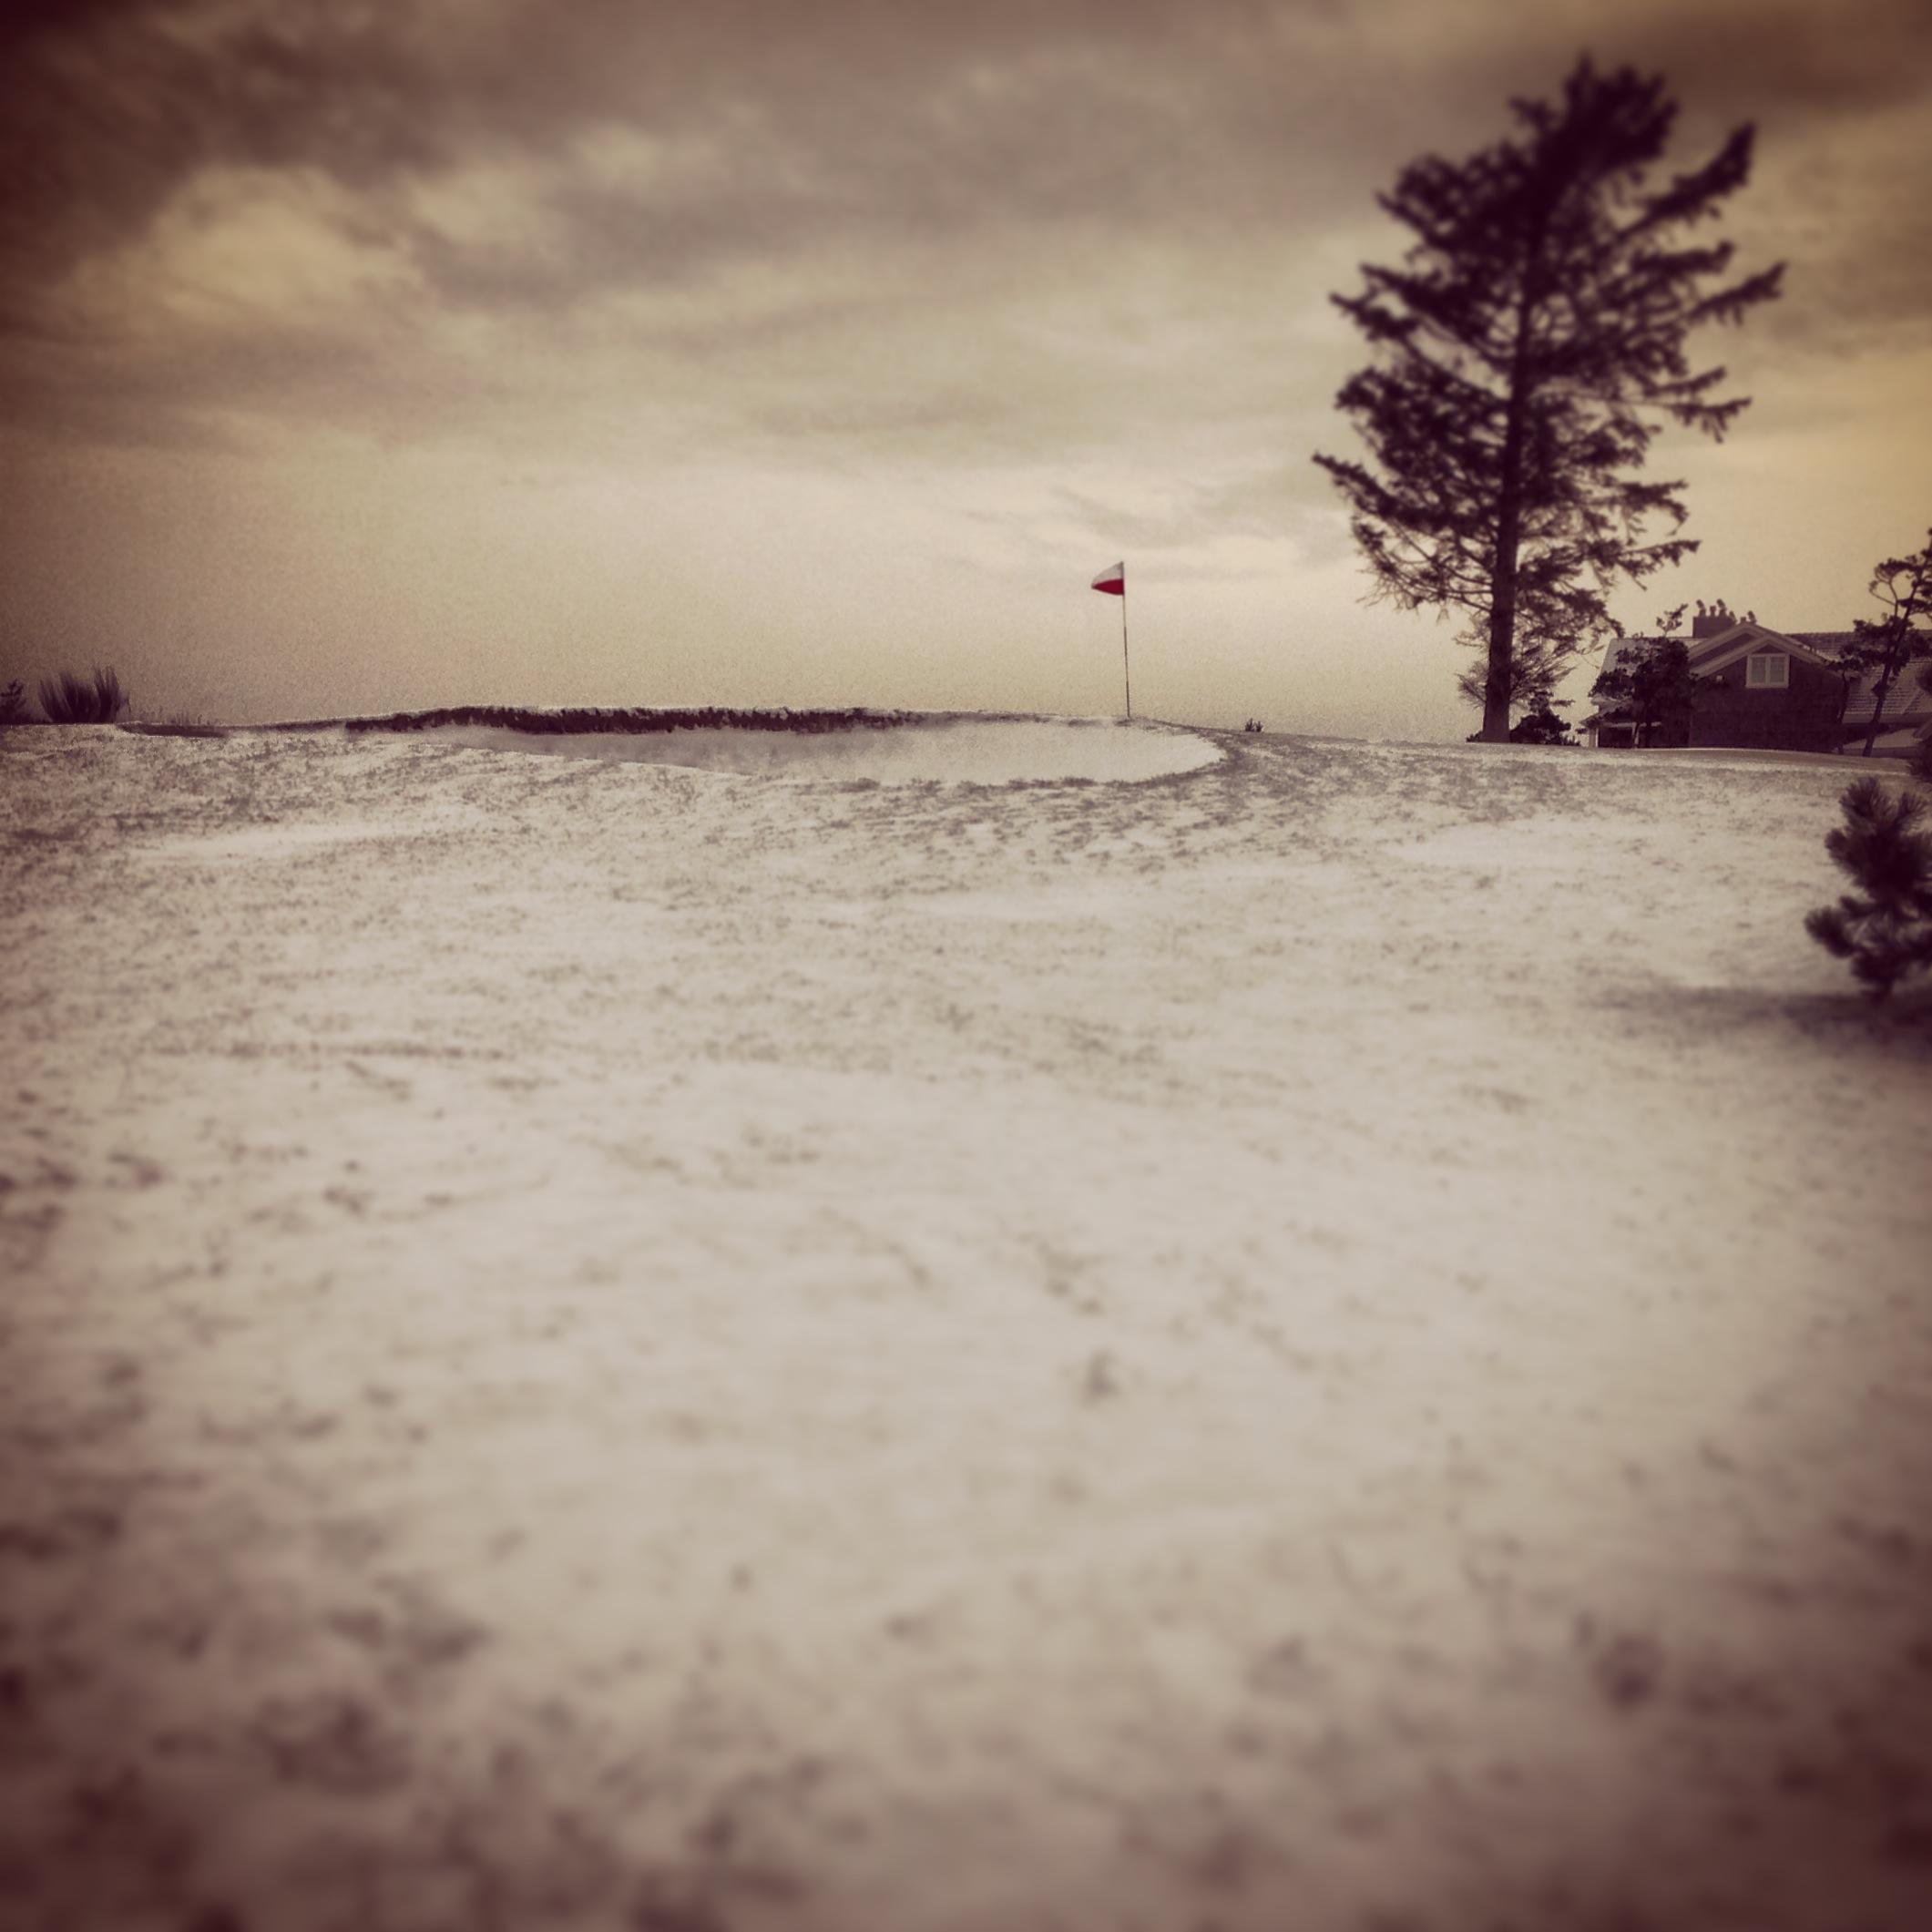 Snow at the Oregon Coast?